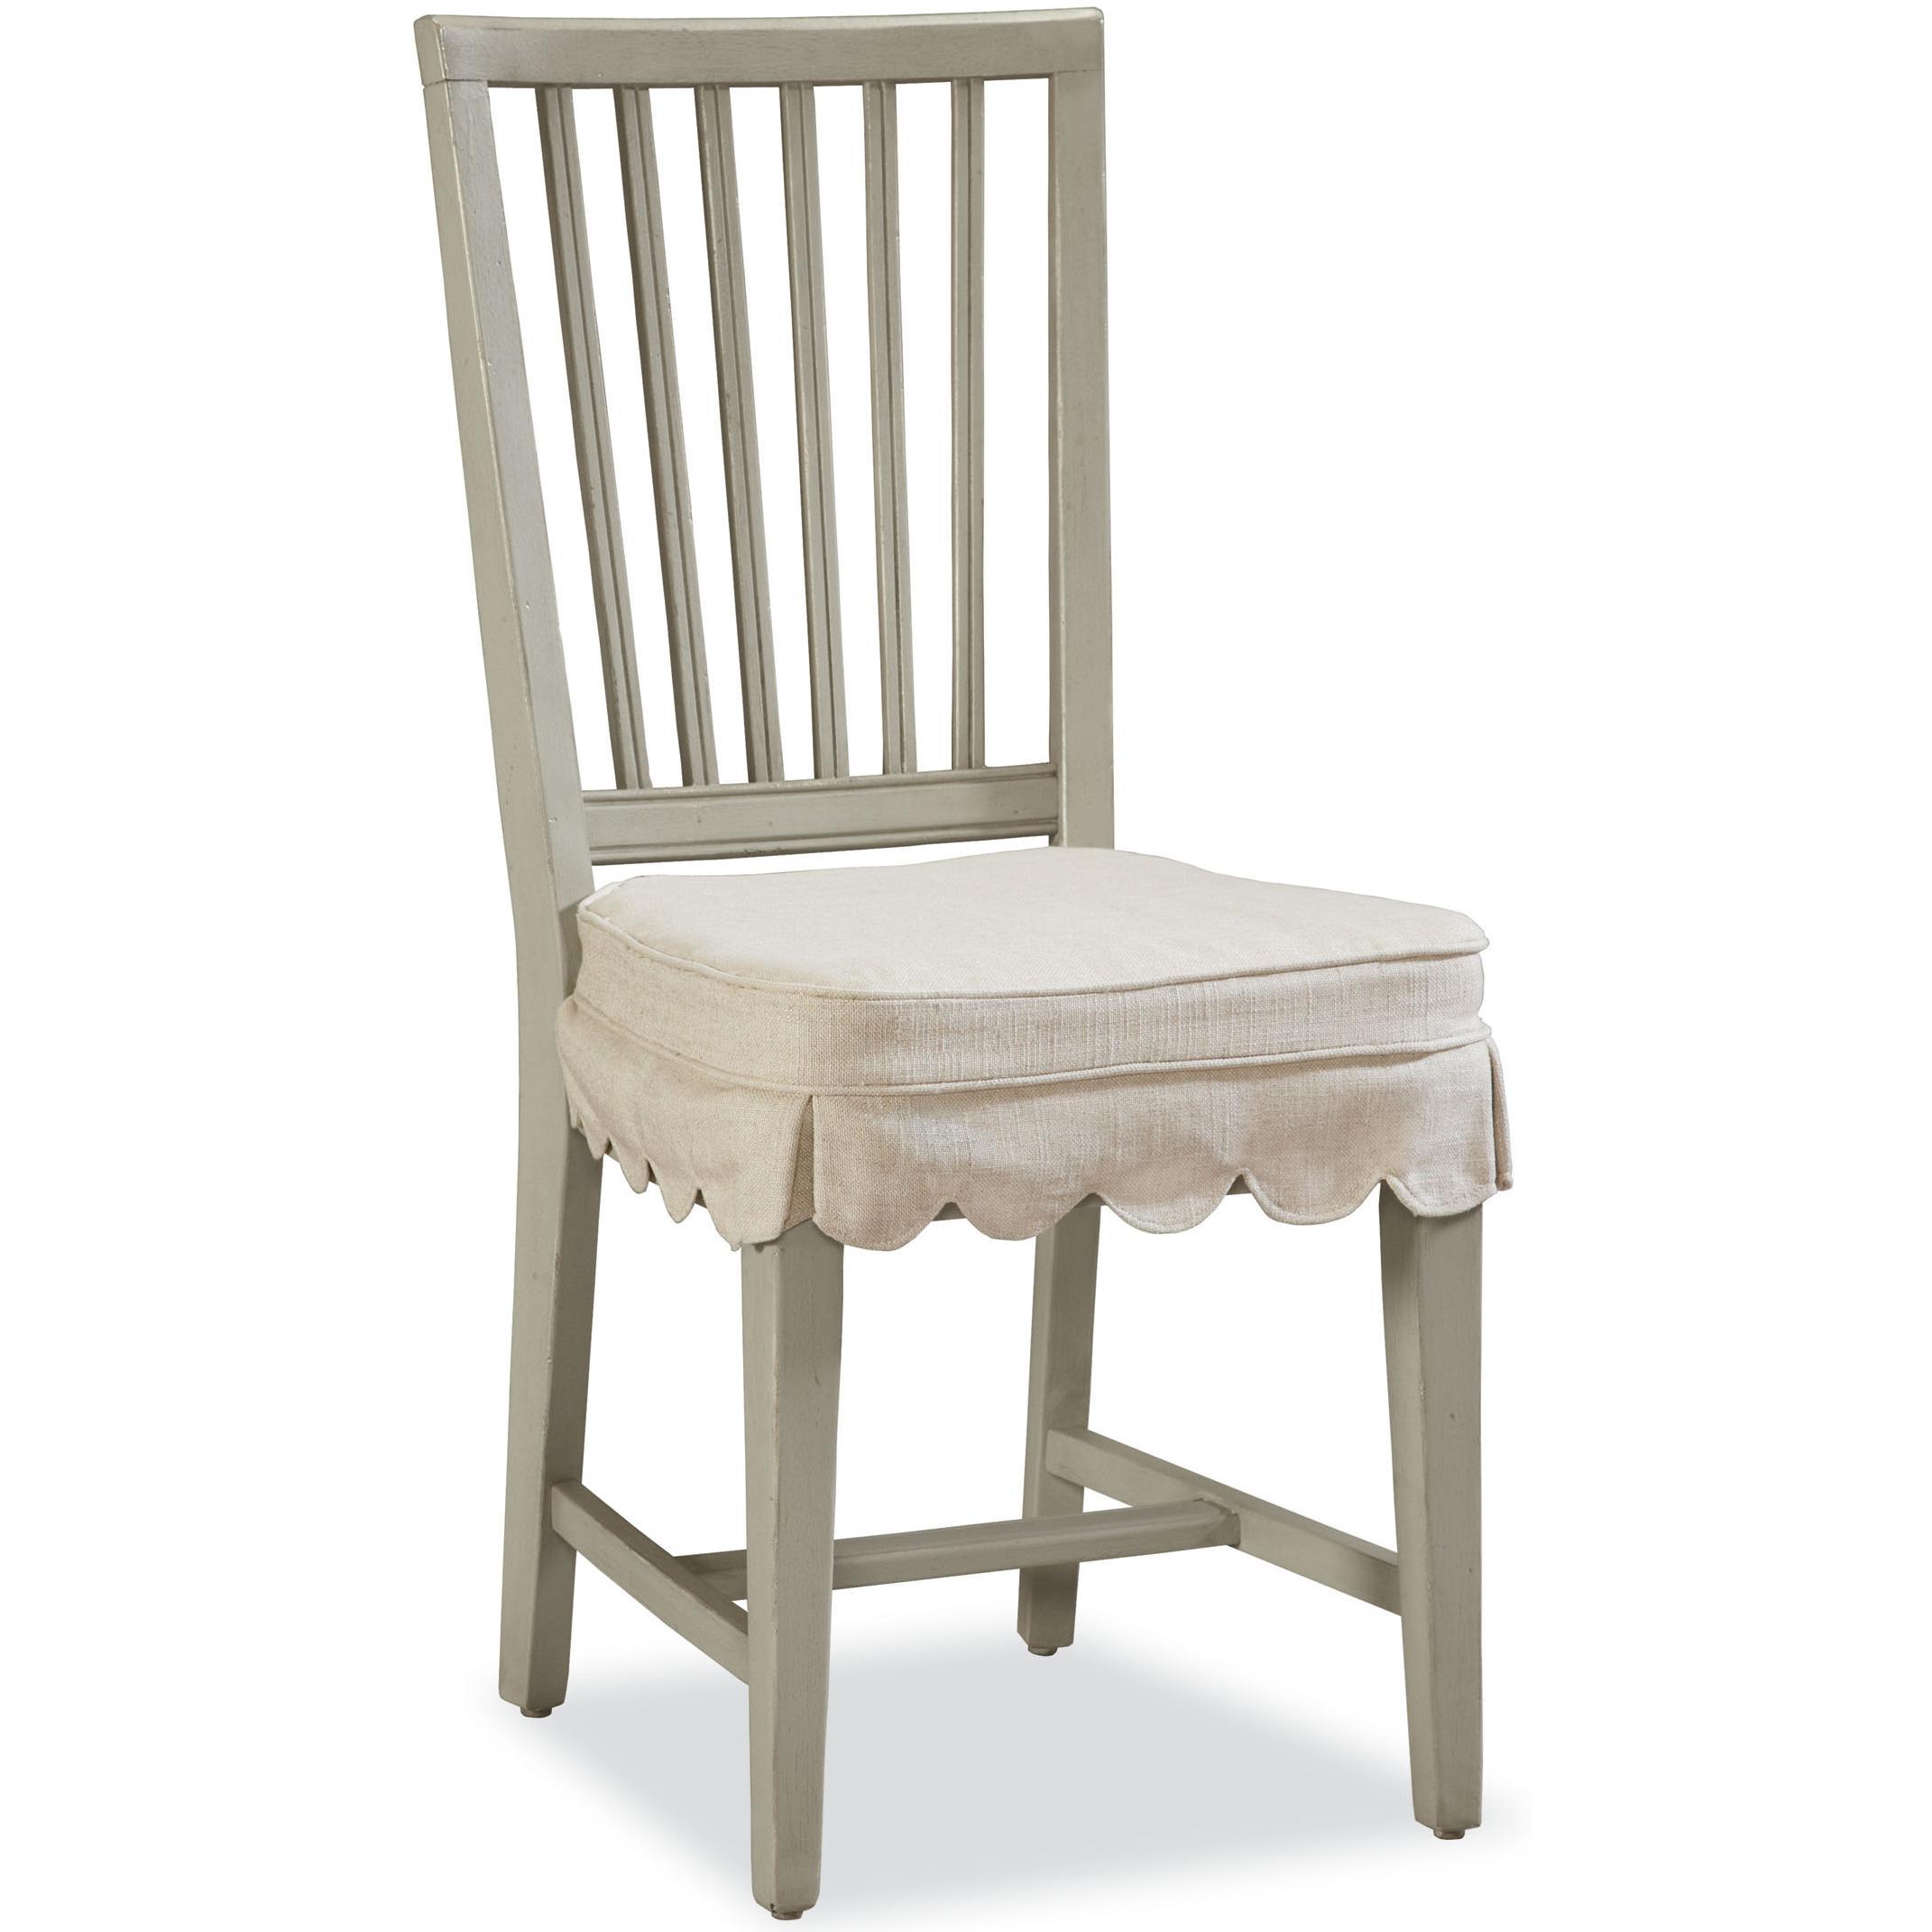 kitchen chair cushions kitchen chair cushions Kitchen chair cushions Photo 3